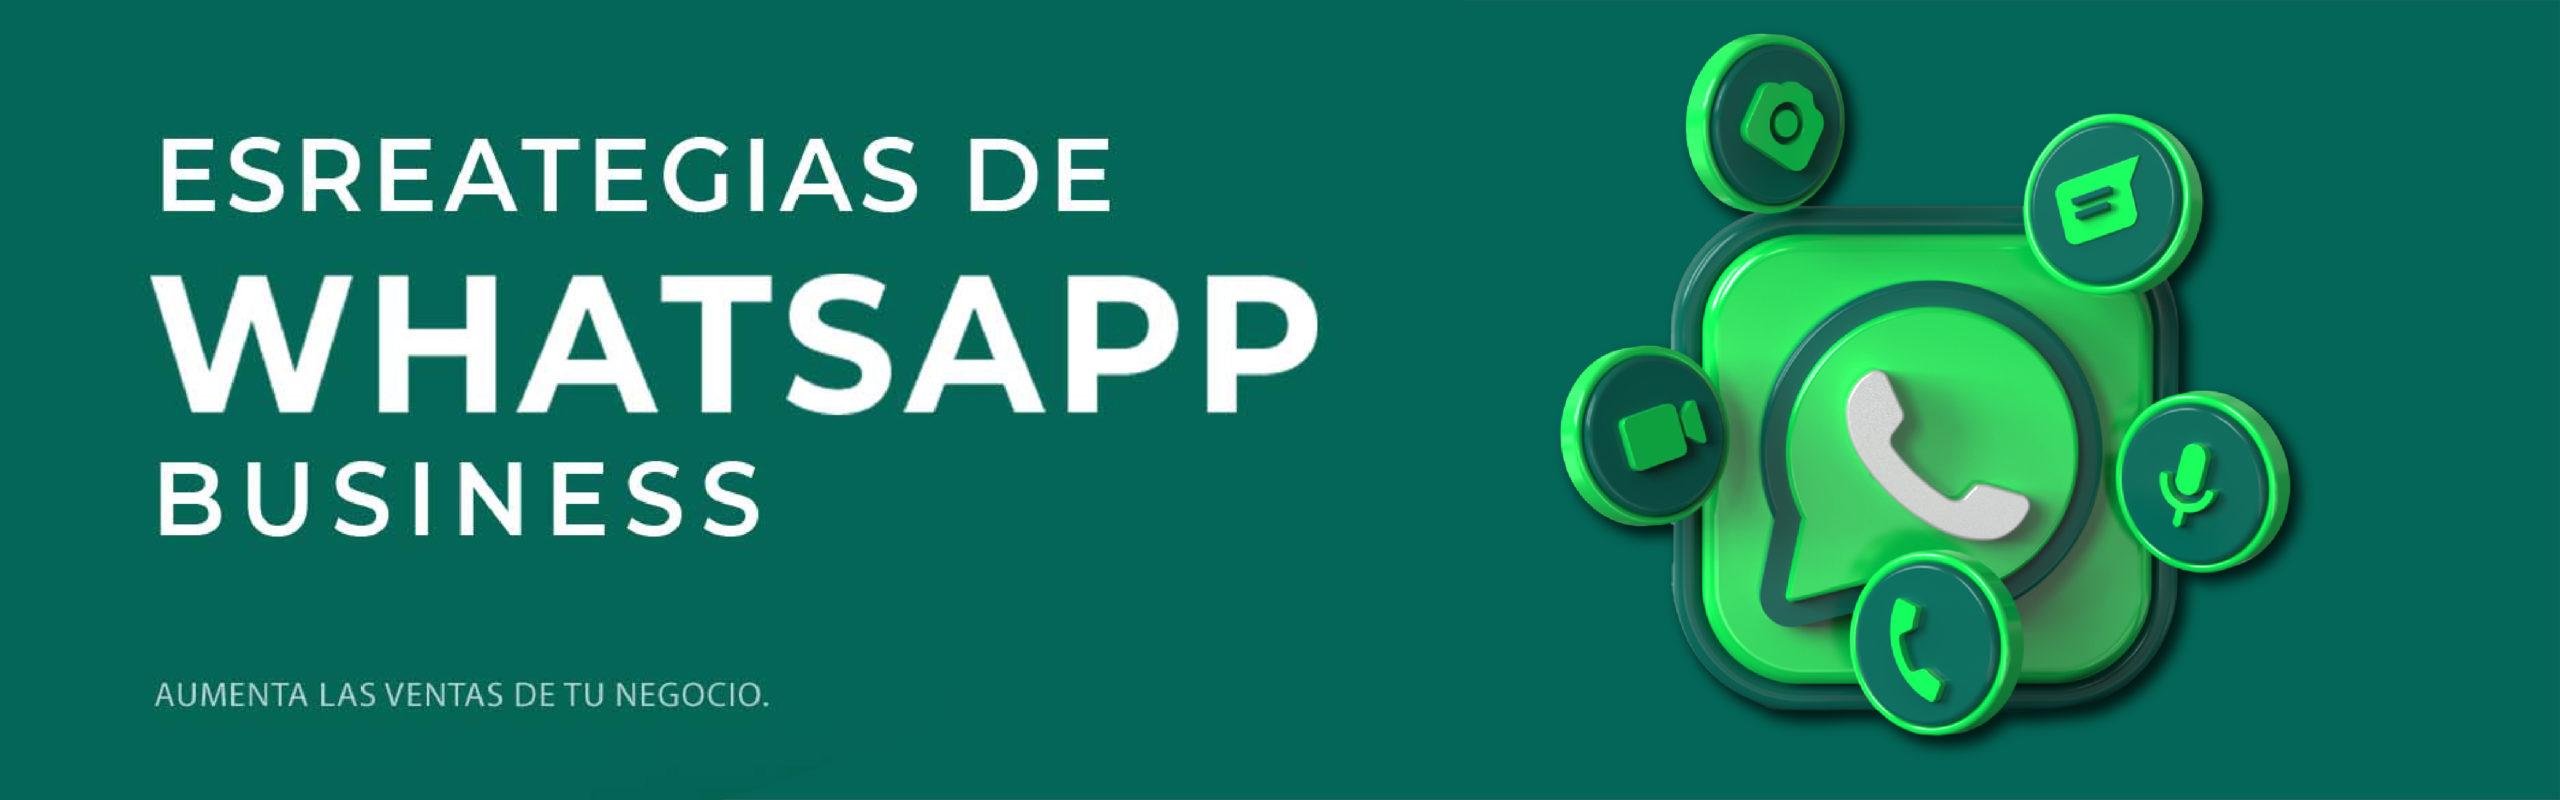 Estrategia perfecta de WhatsApp Marketing en 5 fases